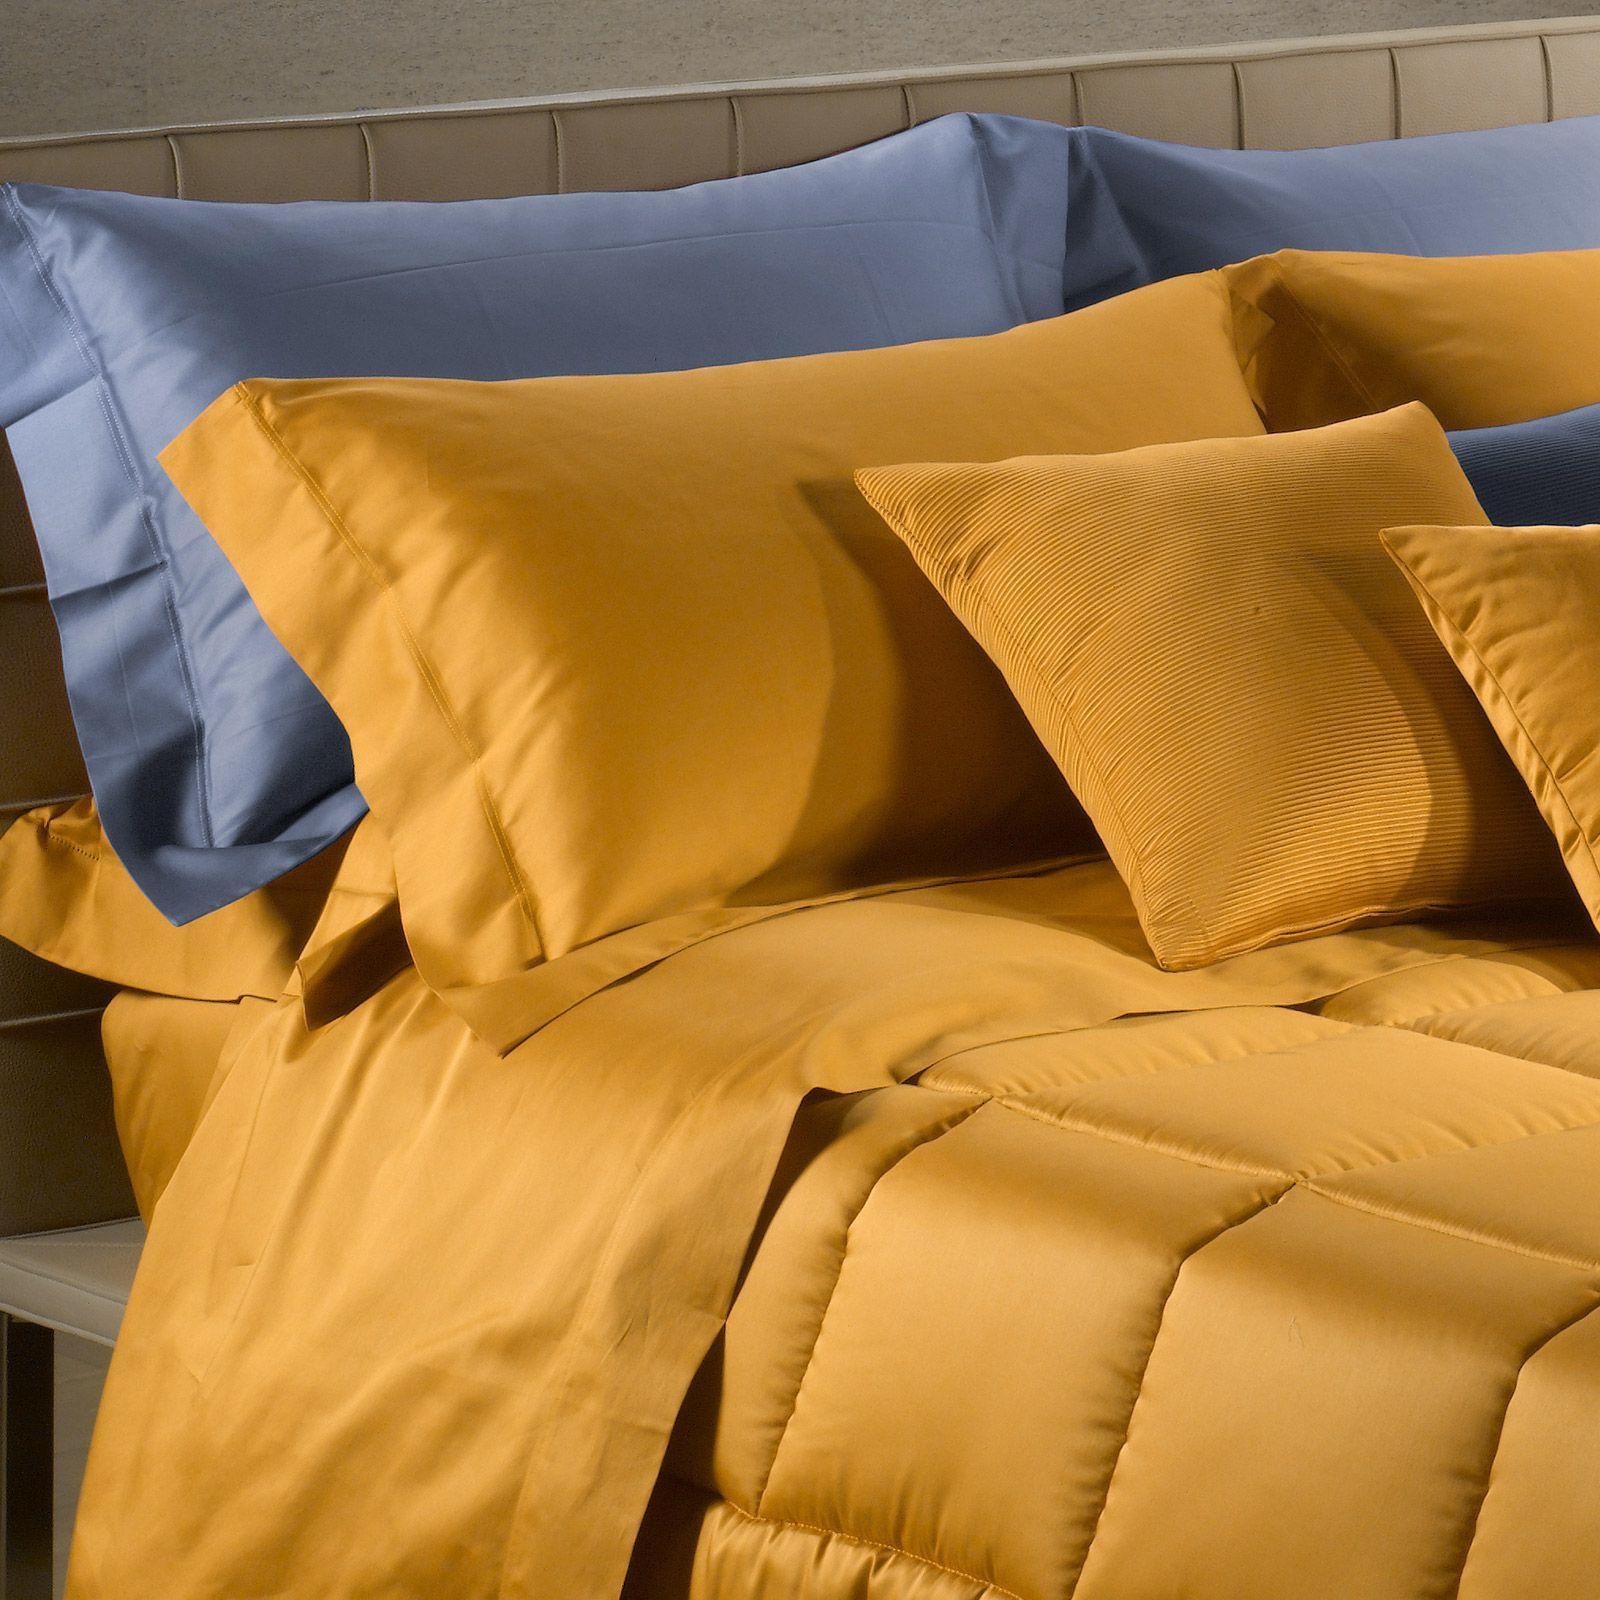 Наволочки для сна Наволочки 2шт 50x70 Caleffi Raso Tinta Unito золотые komplekt-navolochek-50x70-caleffi-raso-tinta-unito-zolotoy-italiya.jpg